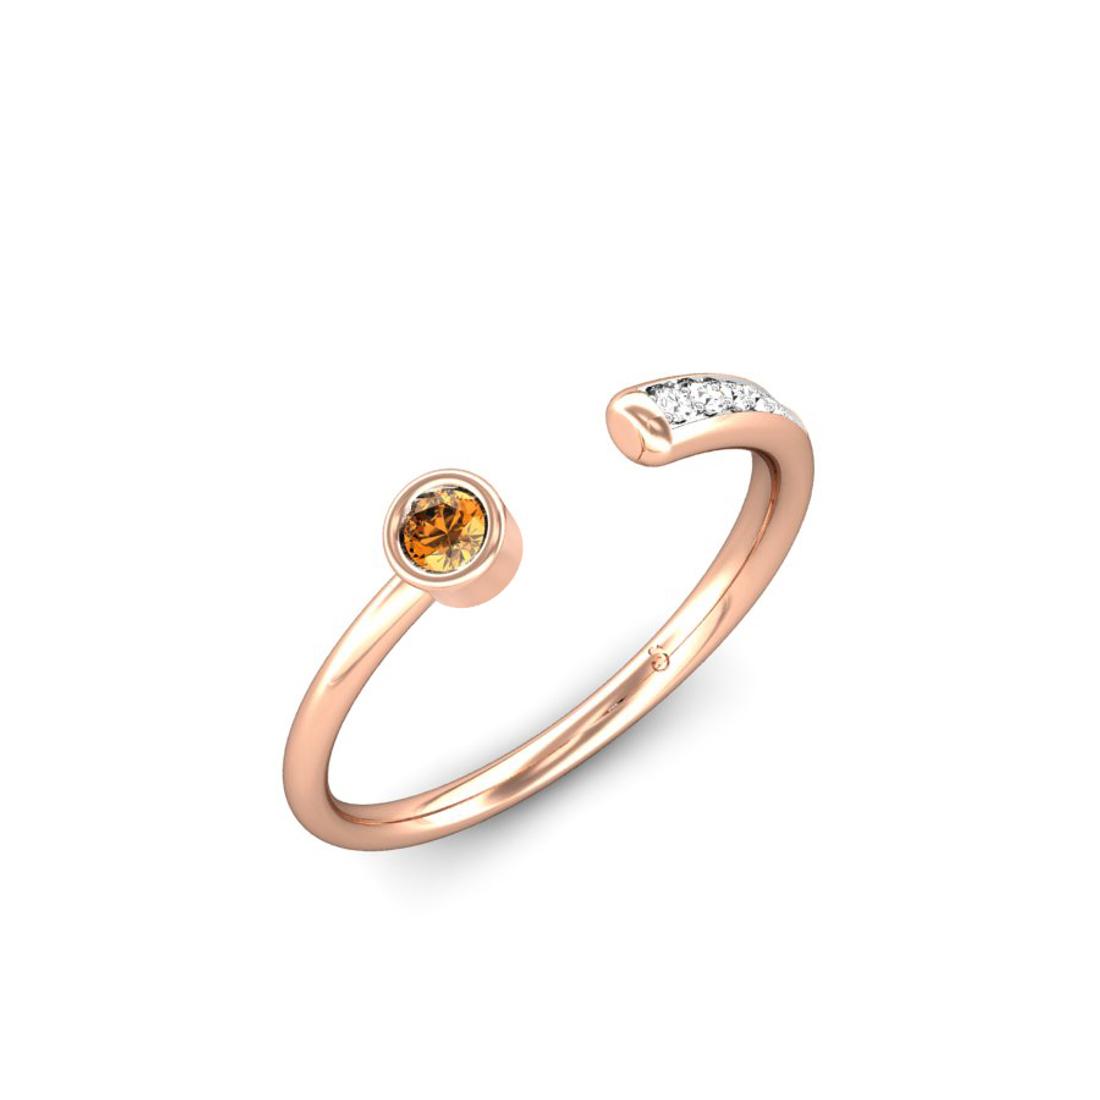 Jewel samarth 18k(750) BIS Hallmark Rose Gold Sparkling Trail  Garnet Ring (CGL Certified)